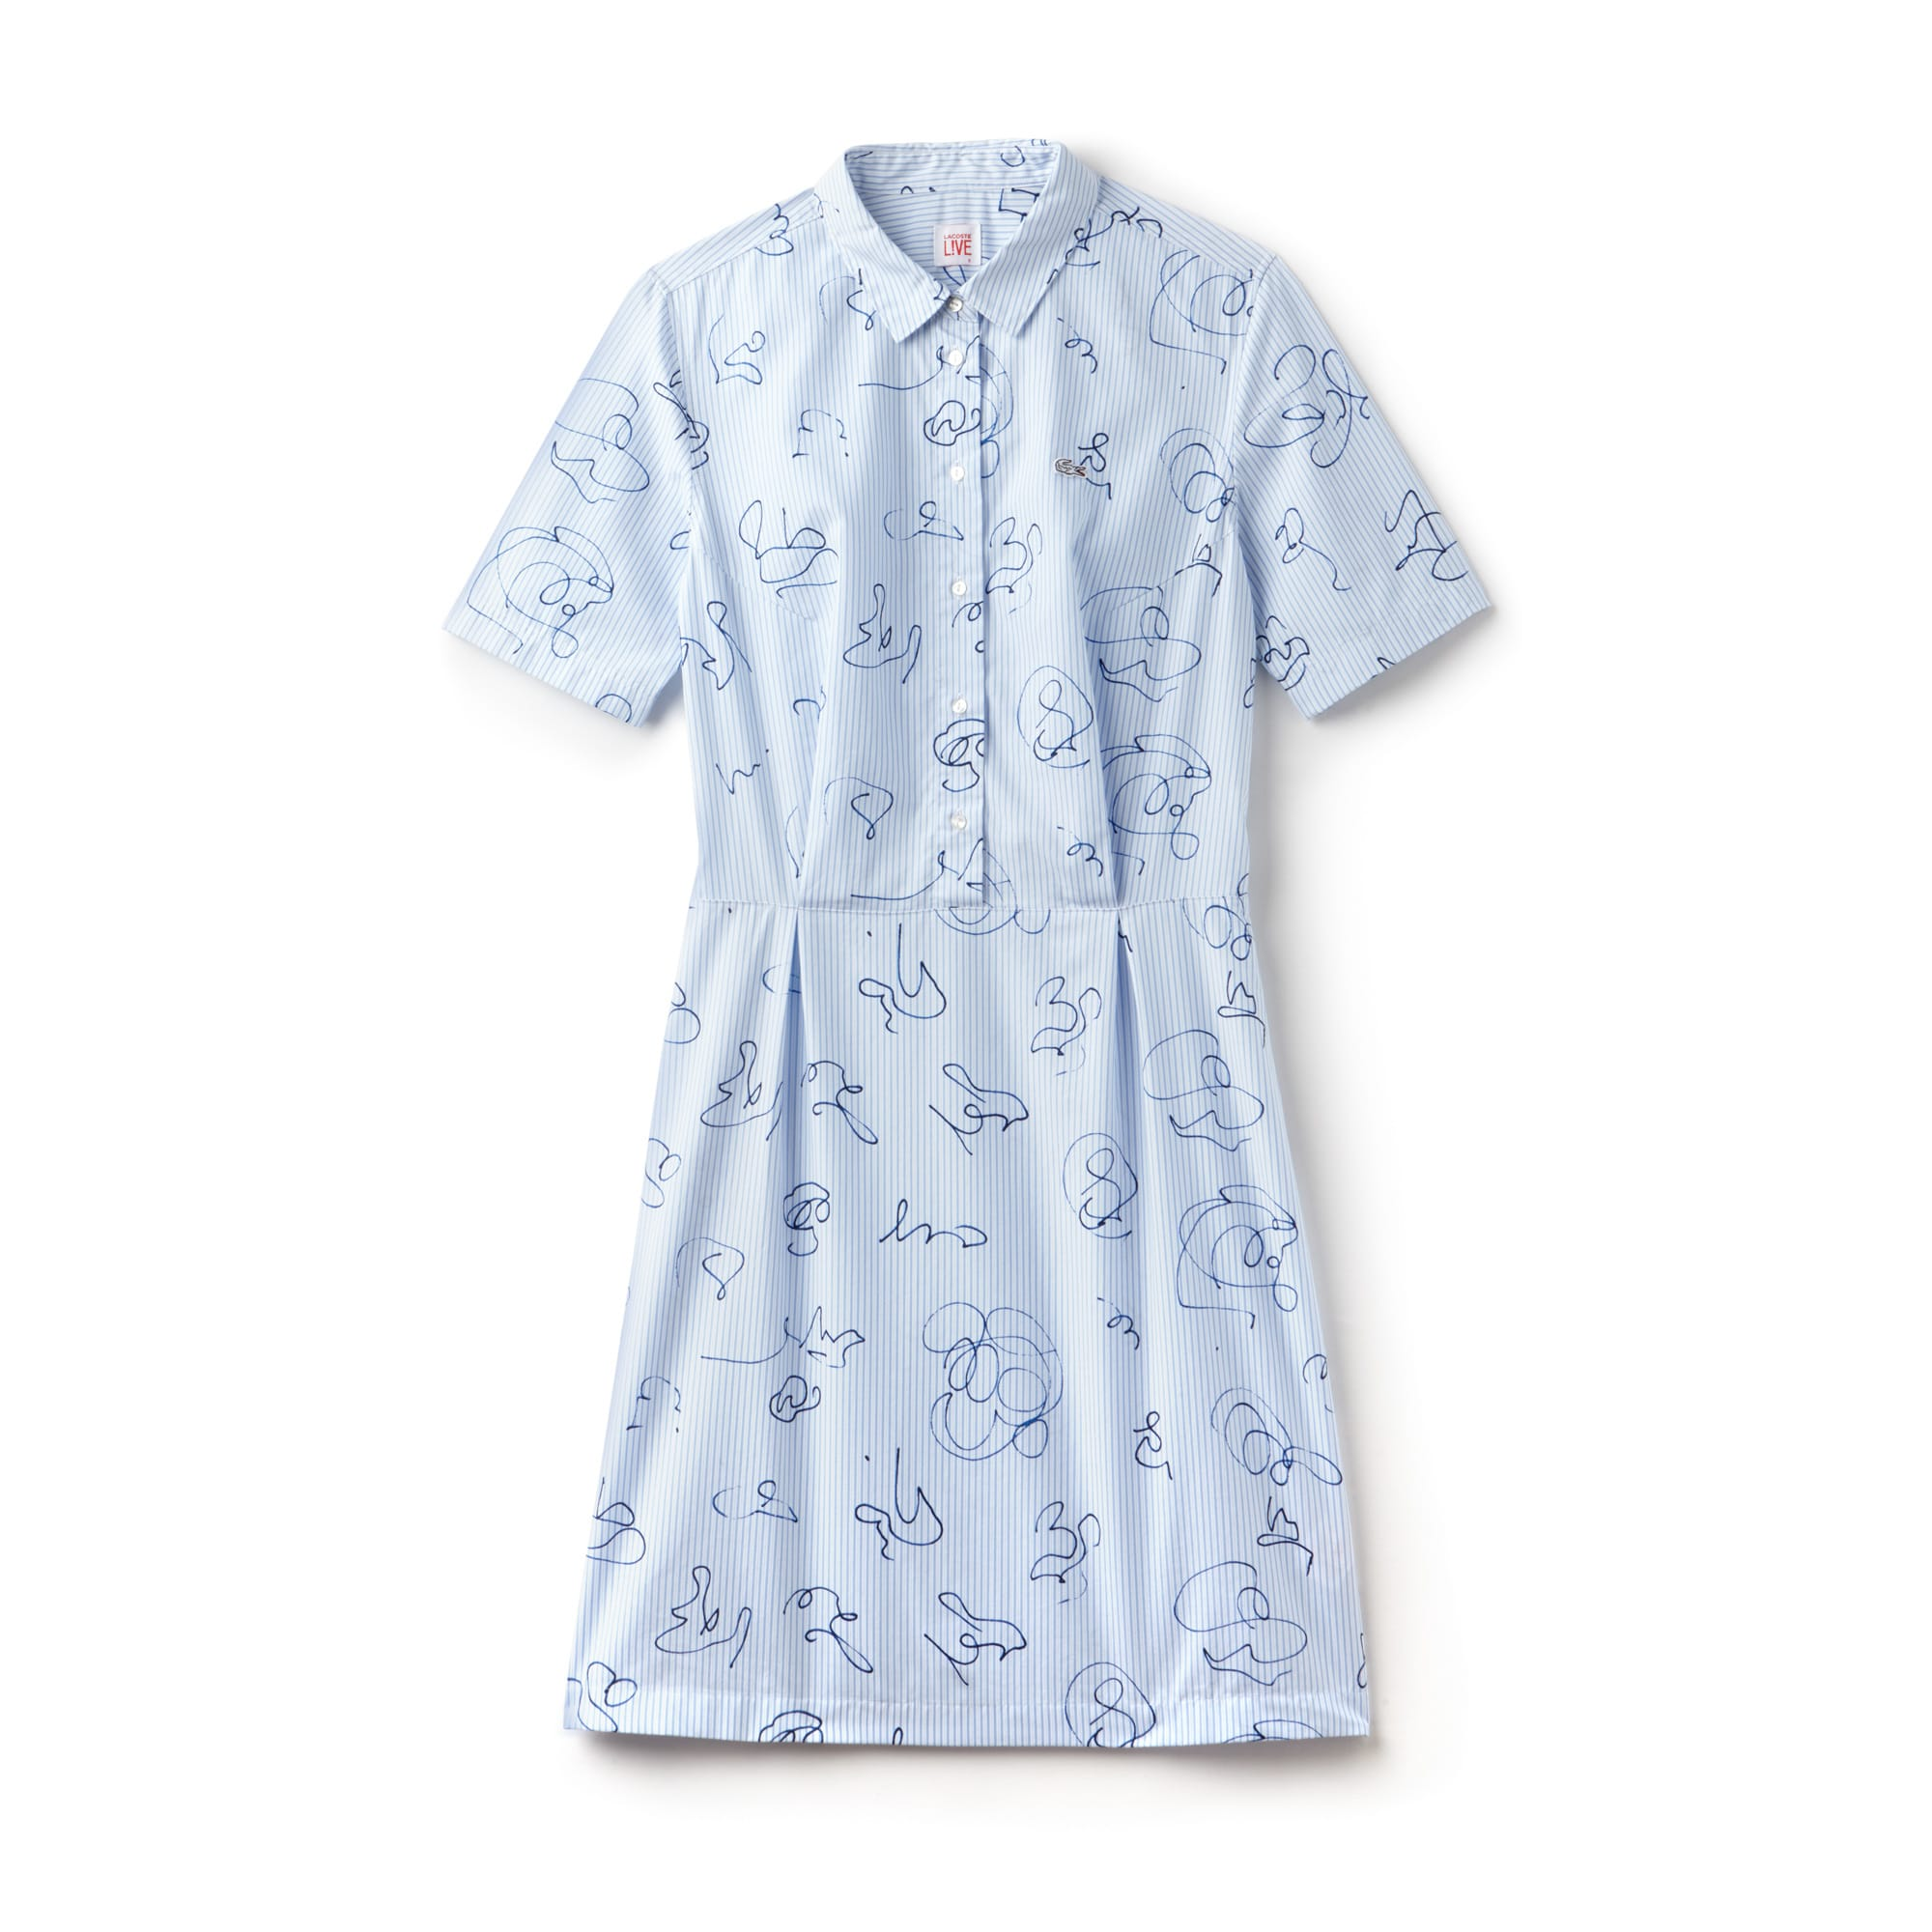 Women's Lacoste LIVE Striped Print Cotton Poplin Shirt Dress